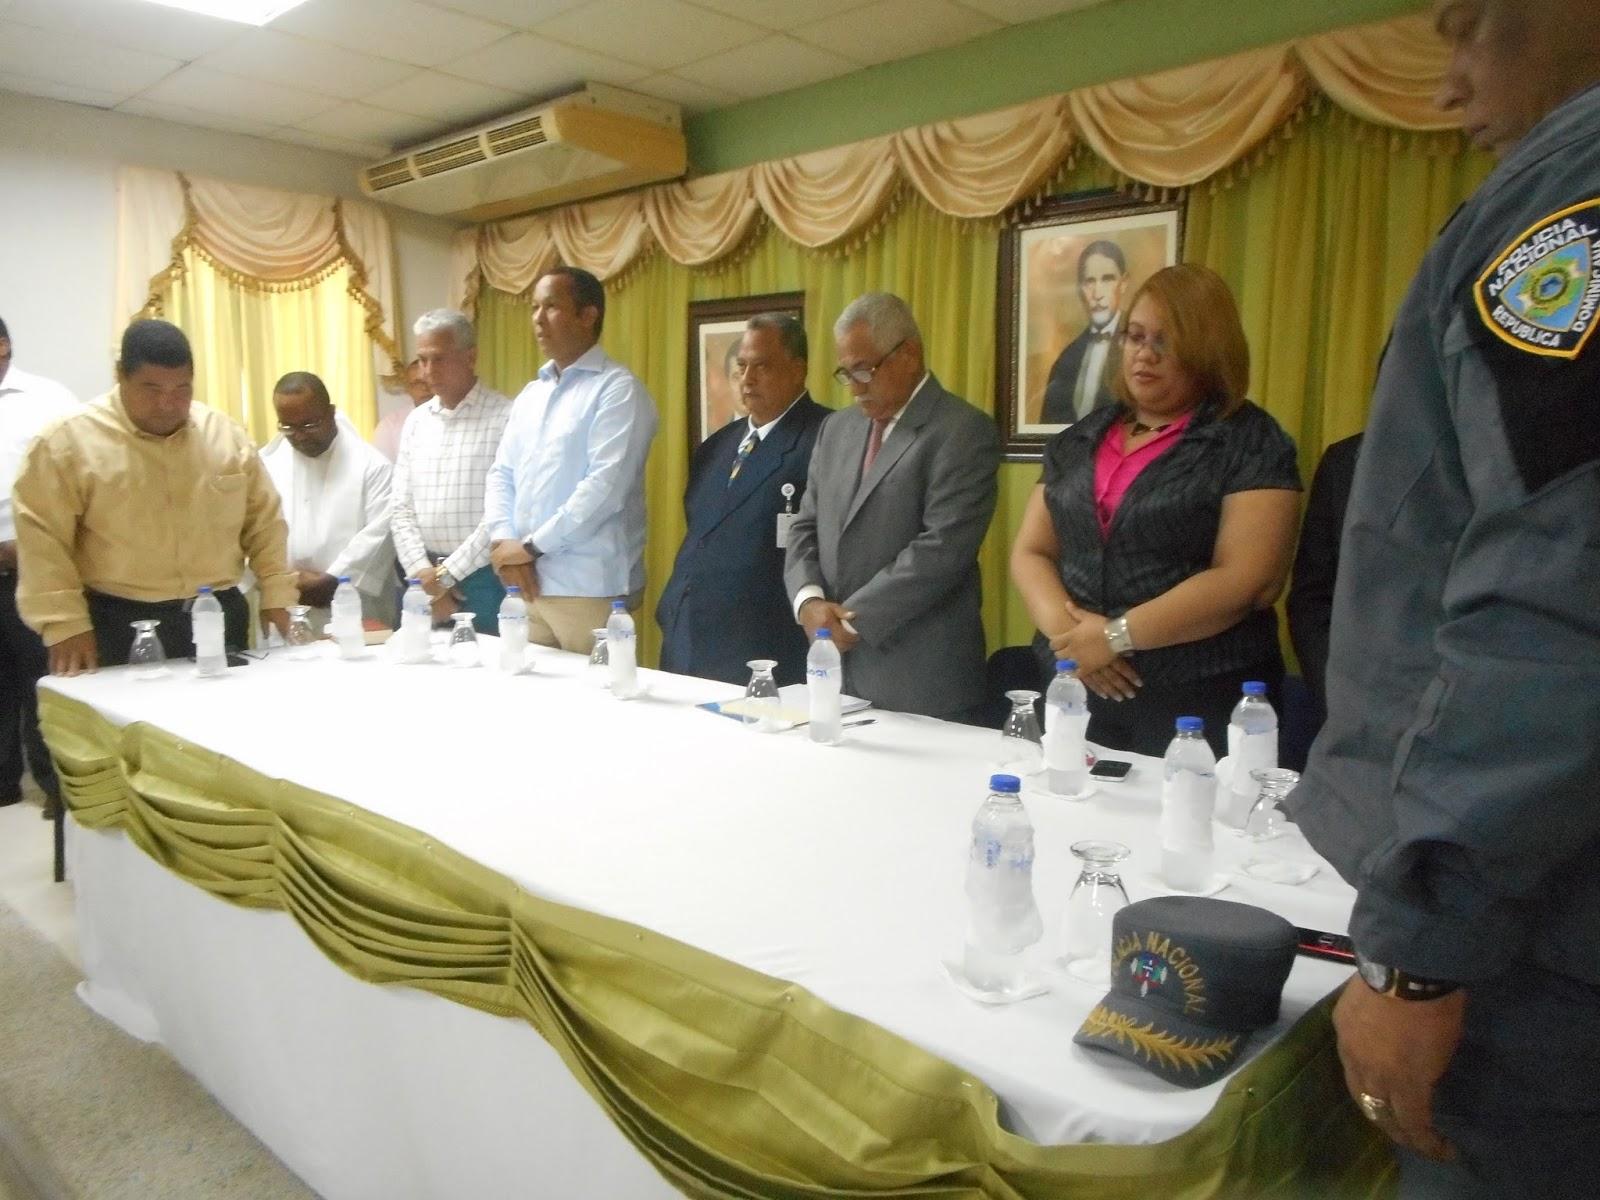 Ministerio de interior y polic a posesiona nuevo for Ministerio interior y policia